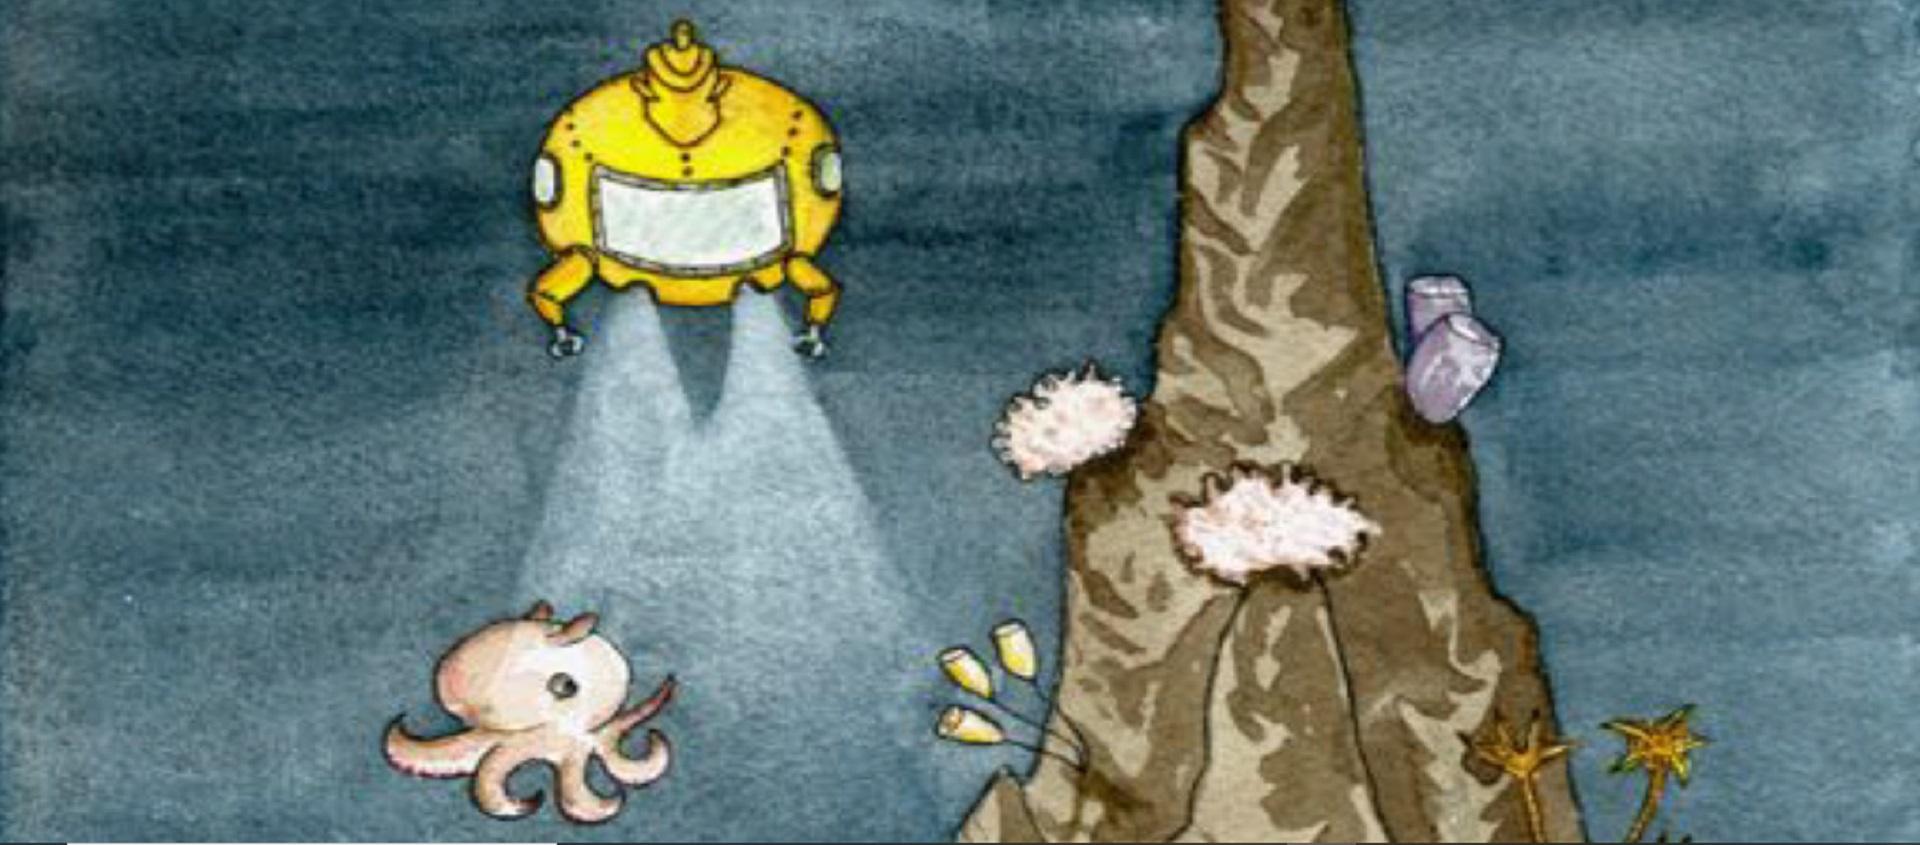 Tesouros do fundo do mar